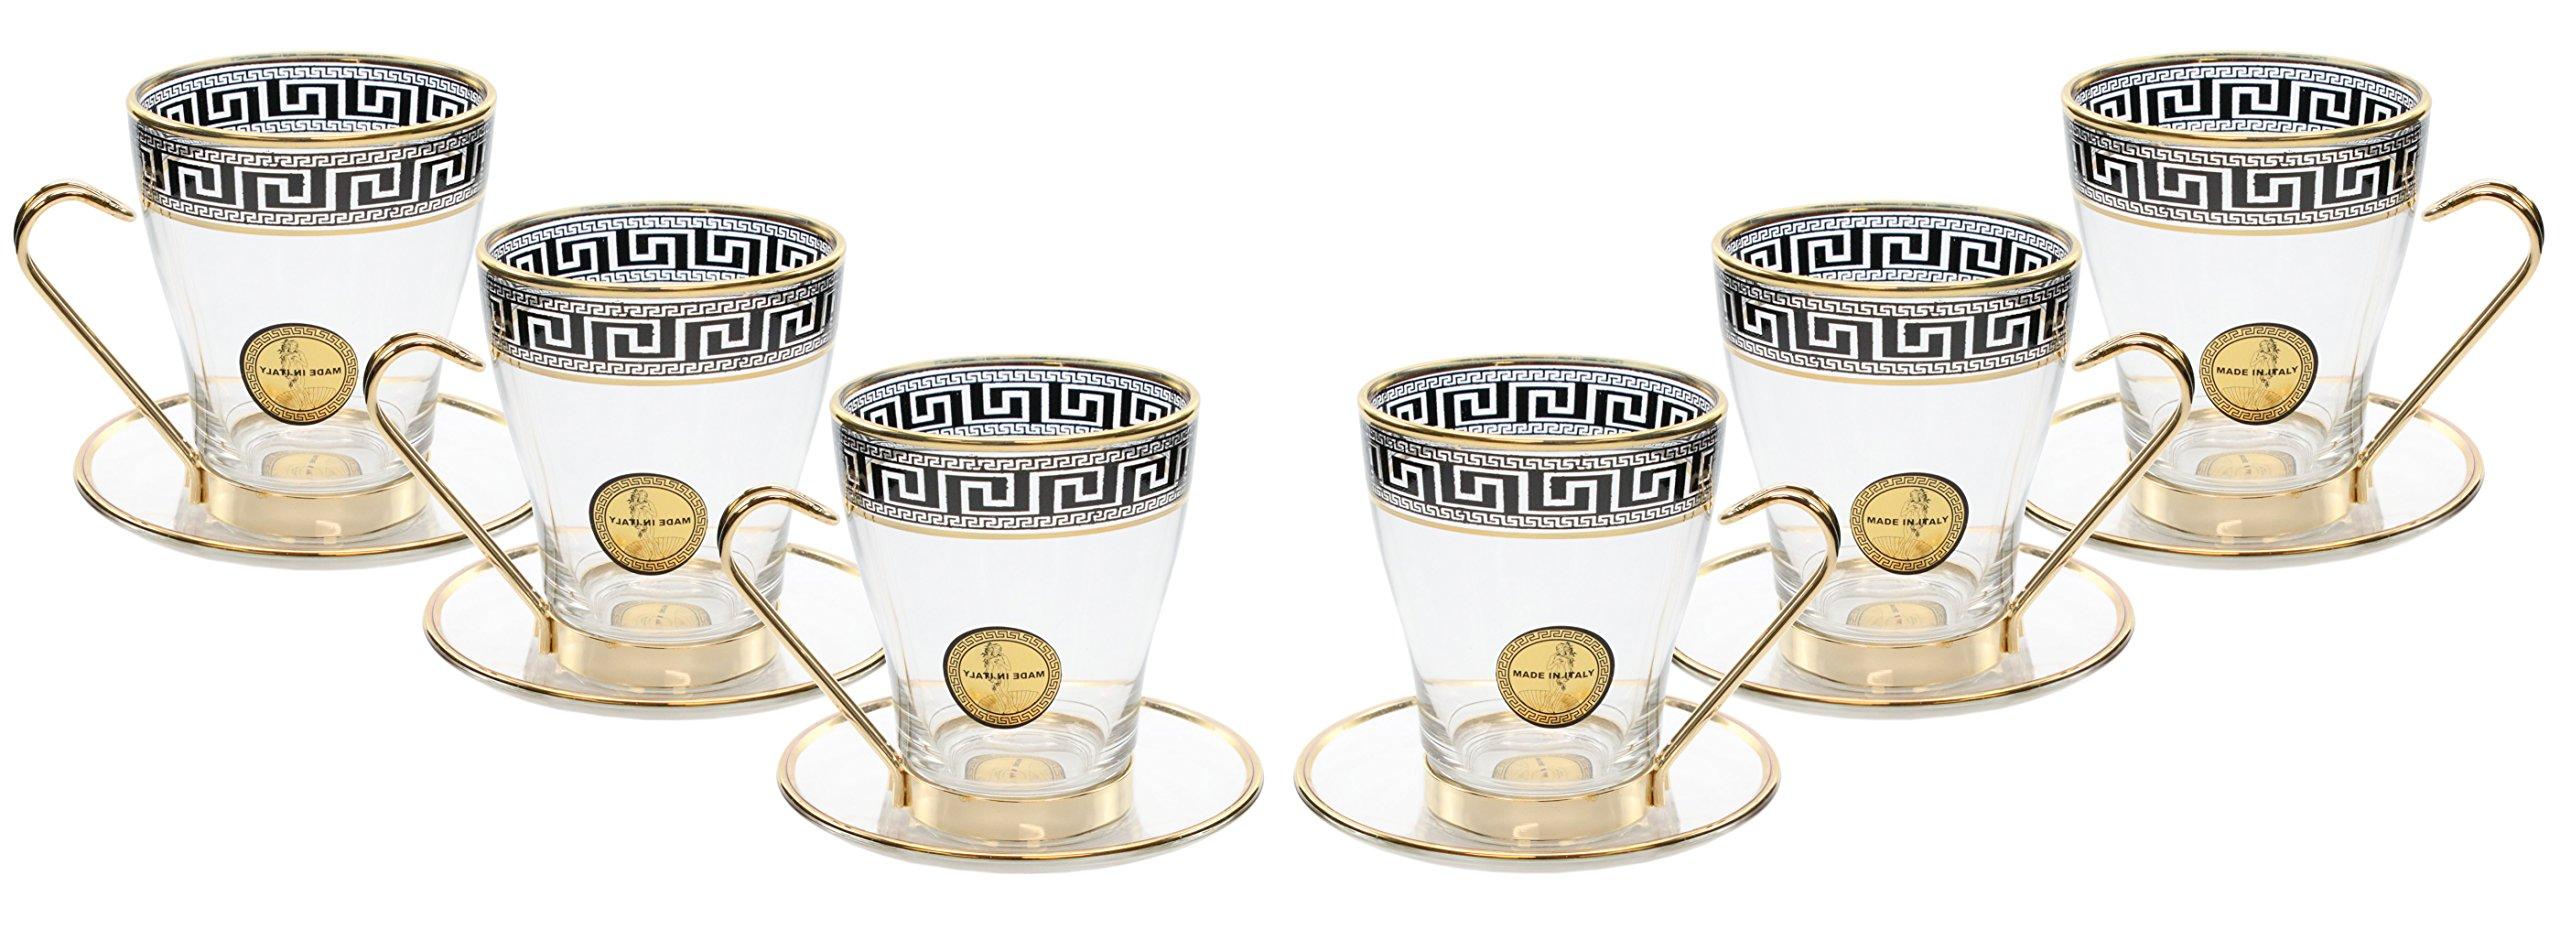 Italian Collection Set of 6 Crystal 8 Oz Turkish Tea Glasses, 24K Gold Rim, Vintage Luxury Pattern